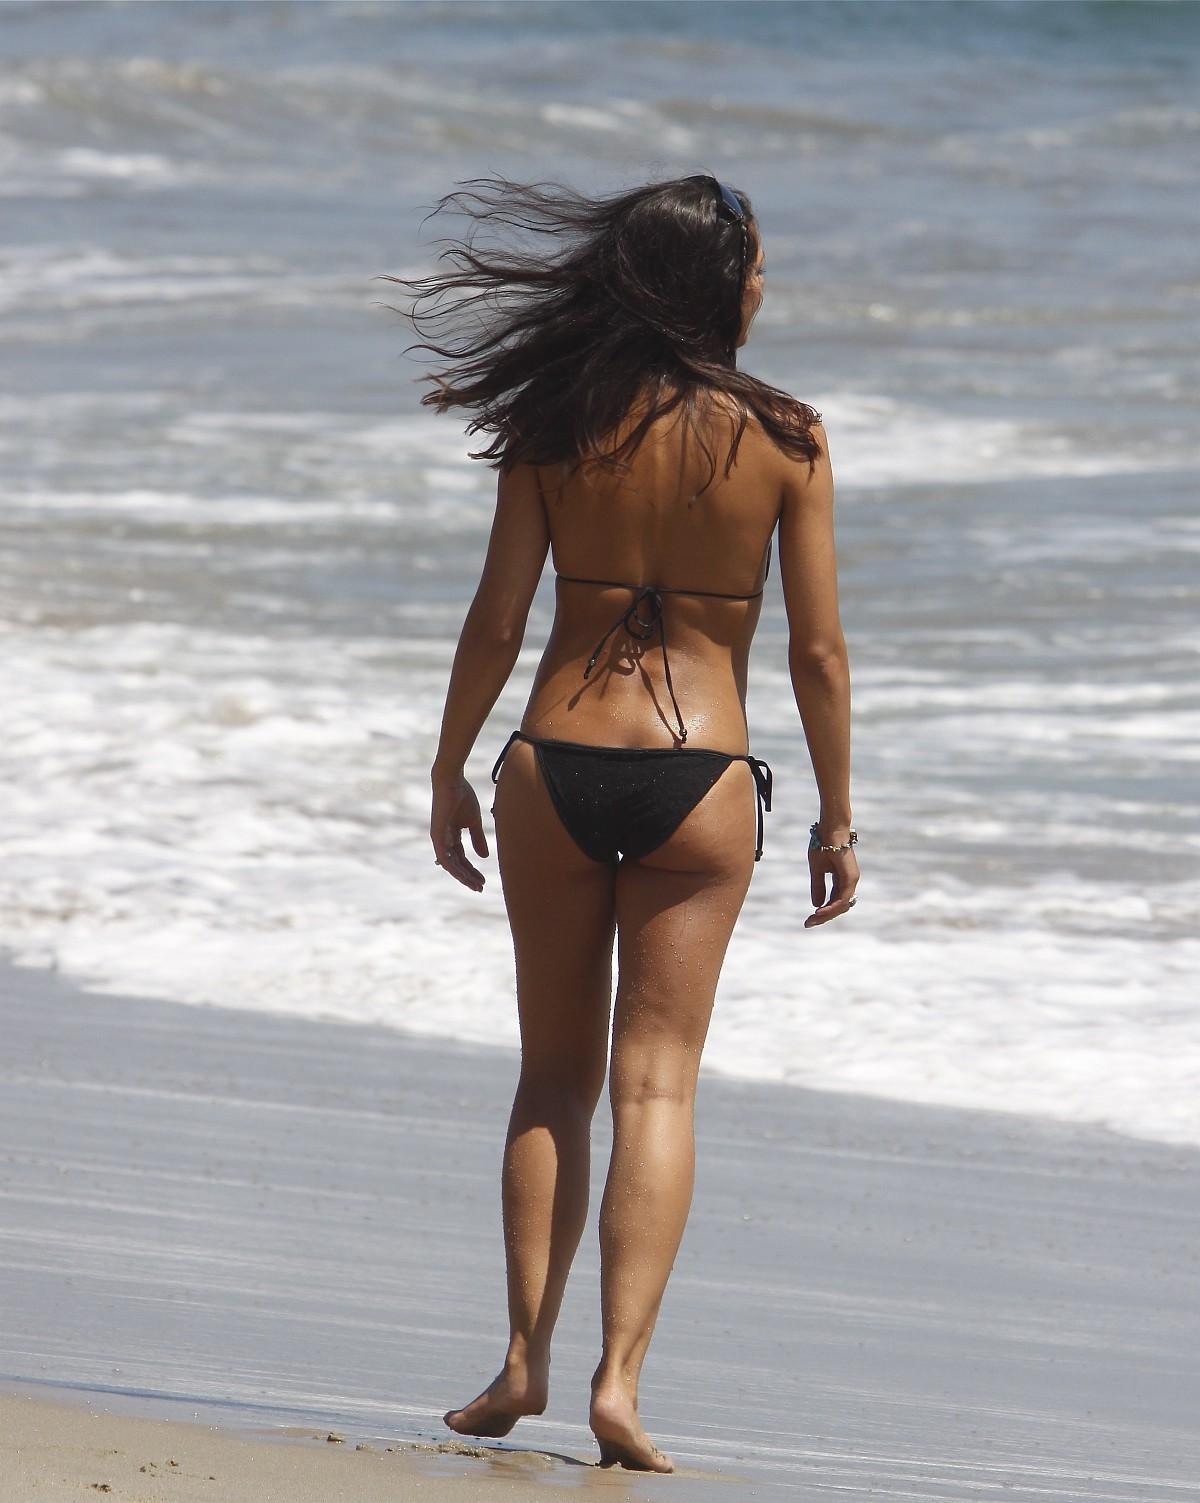 http://4.bp.blogspot.com/-8nXss8TuYYk/TbvLLd2xYjI/AAAAAAAABig/zq5T0y-jVYs/s1600/4840_adrianne-curry-bikini-1-09.jpg